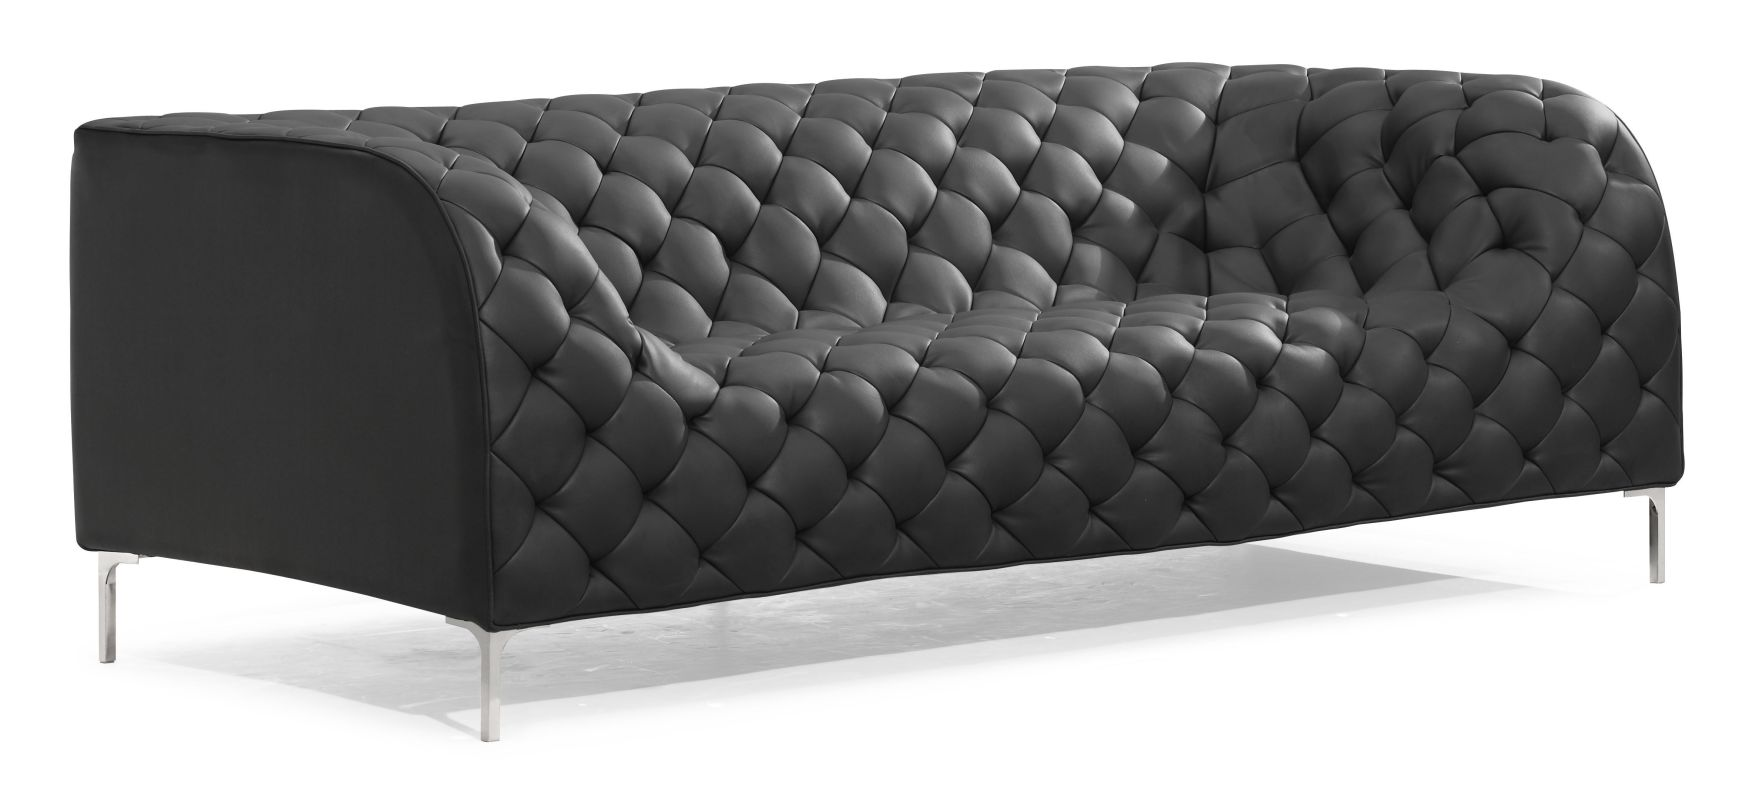 Zuo Modern Providence Sofa Providence Sofa Black Furniture Sofas